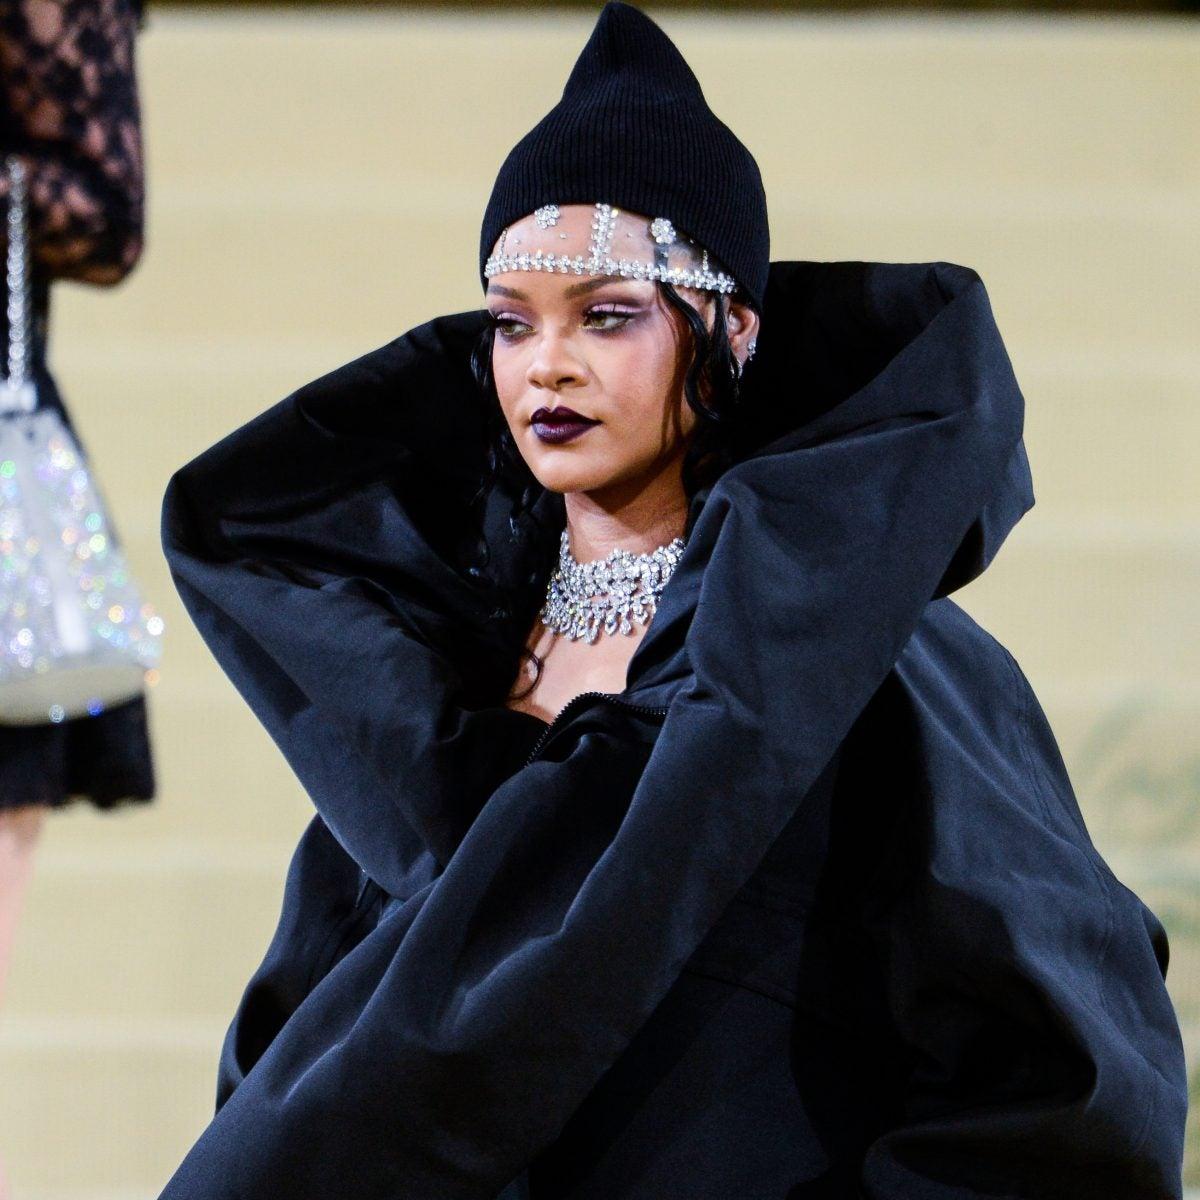 Exclusive: Rihanna Shares The Details Behind Her MET Gala Carpet Look